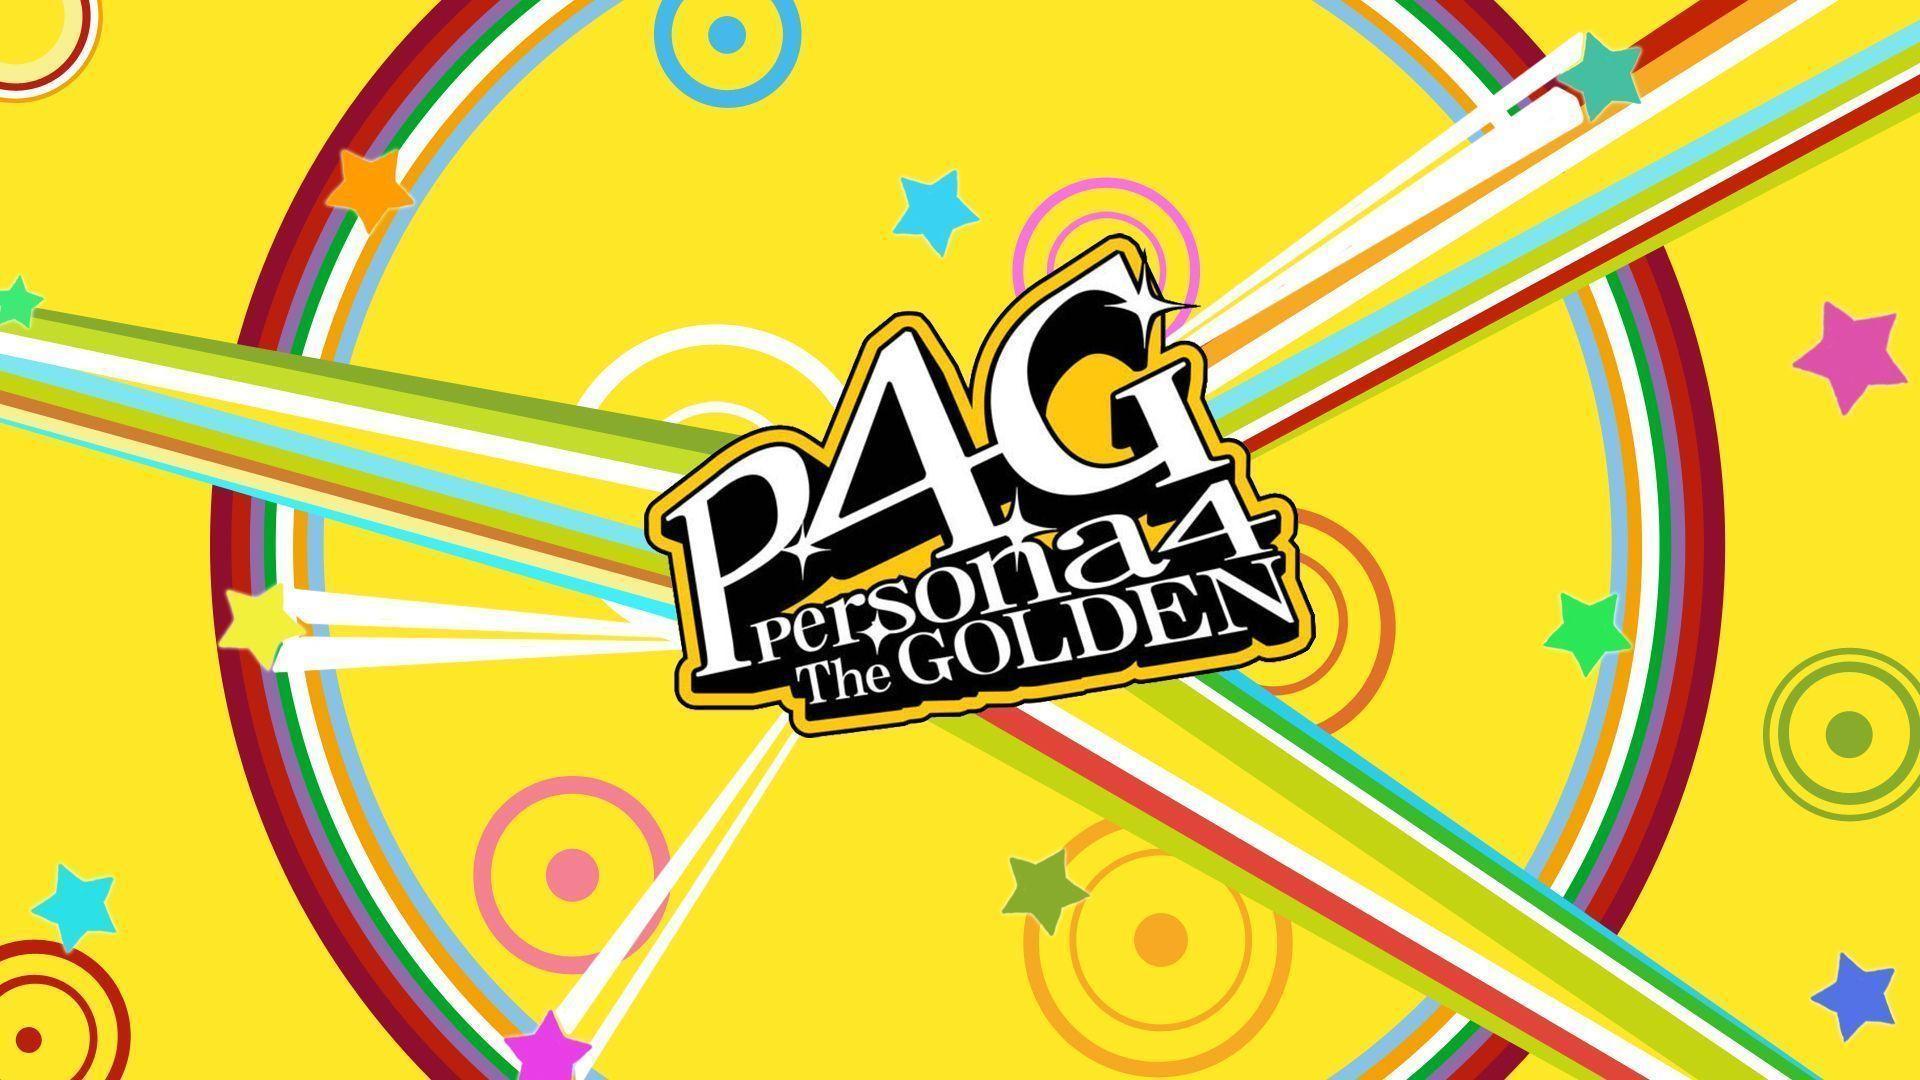 Download Persona 4 Golden Psp Free - sokolwalker